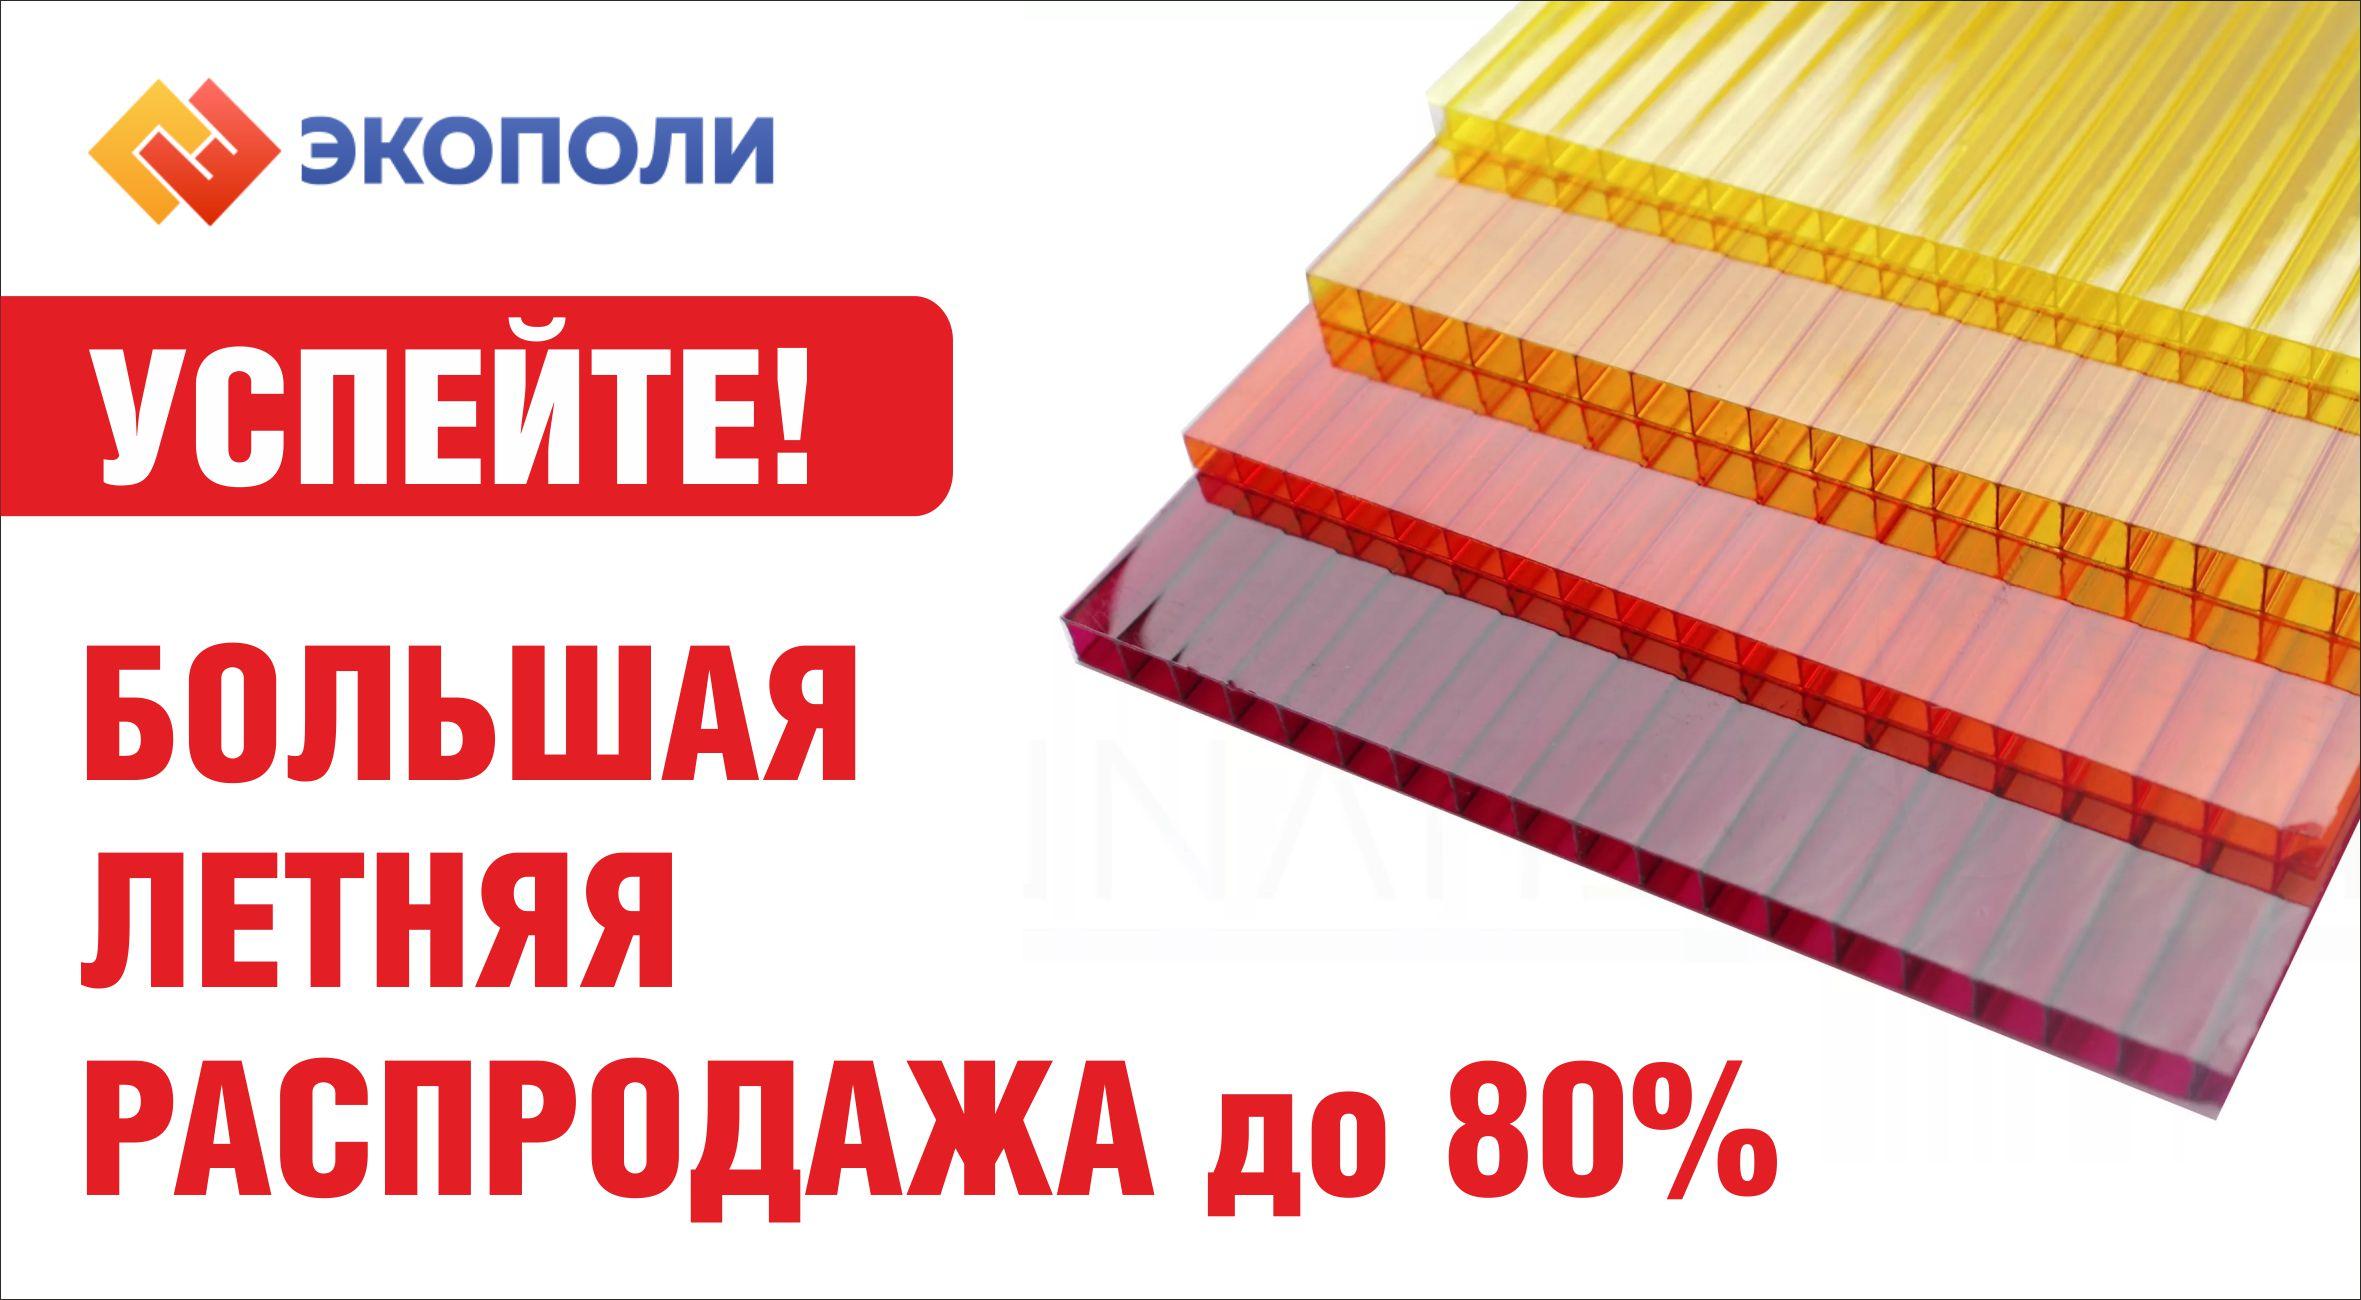 http://ecopoli.ru/images/upload/экополи.jpg